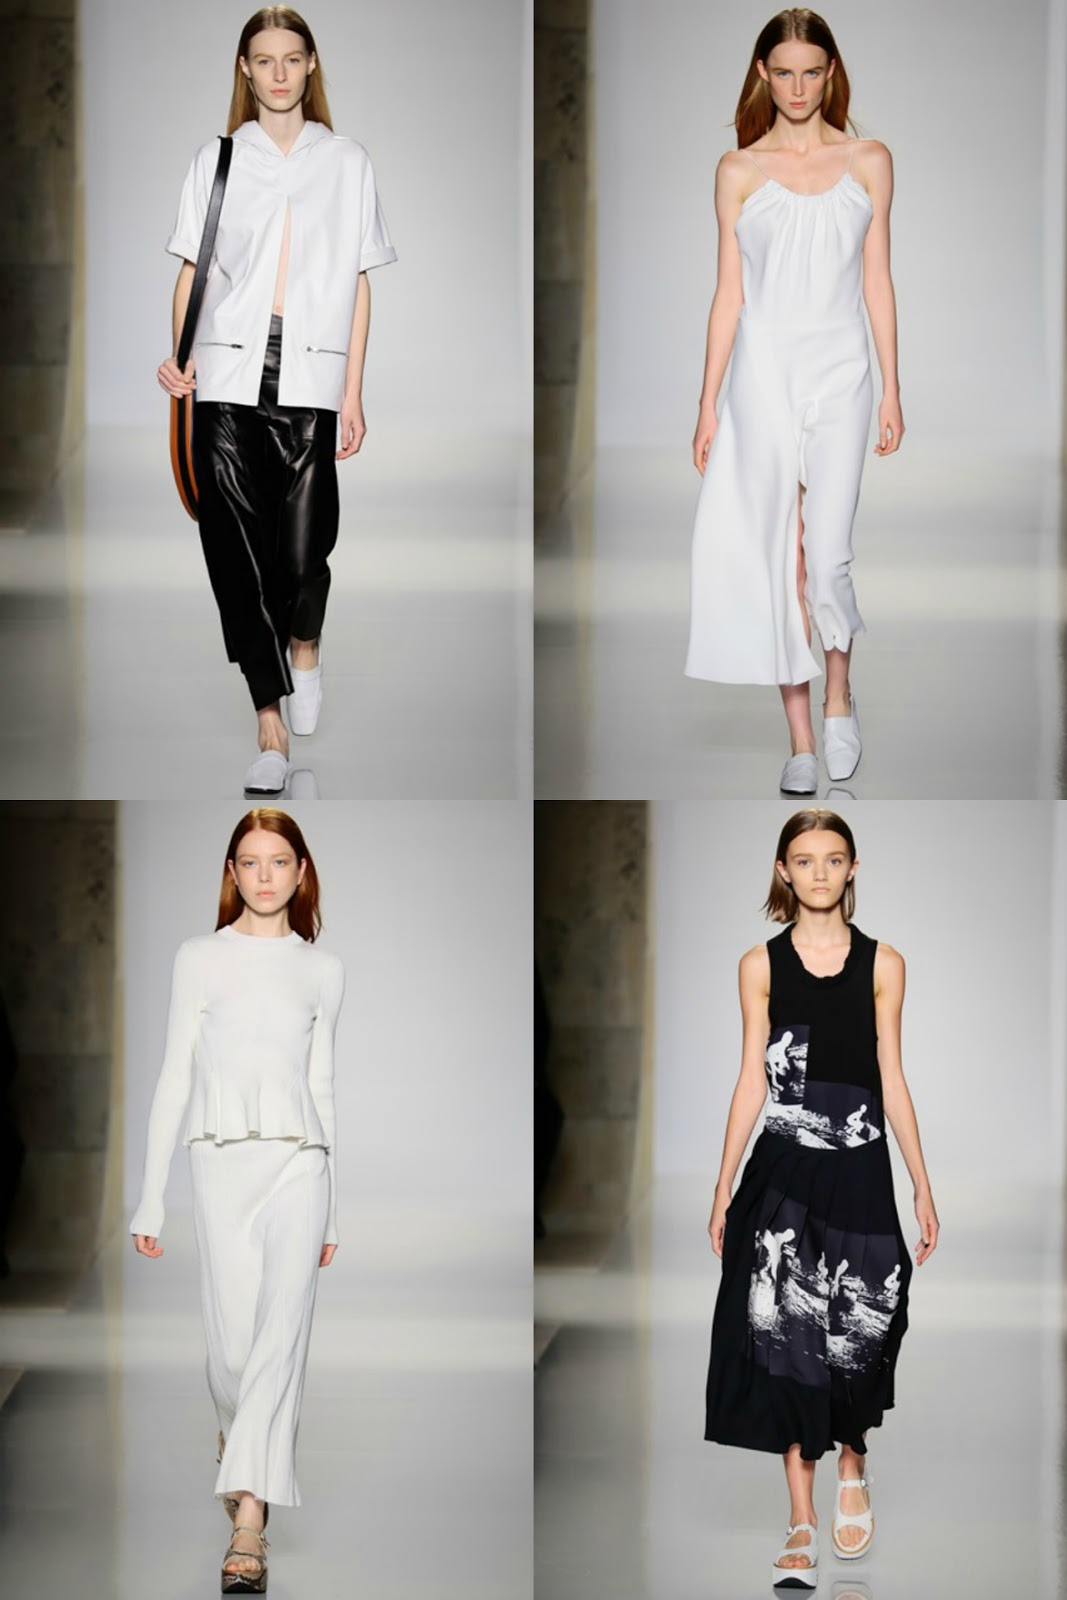 Eniwhere Fashion - B&W - Victoria Beckham SS2016